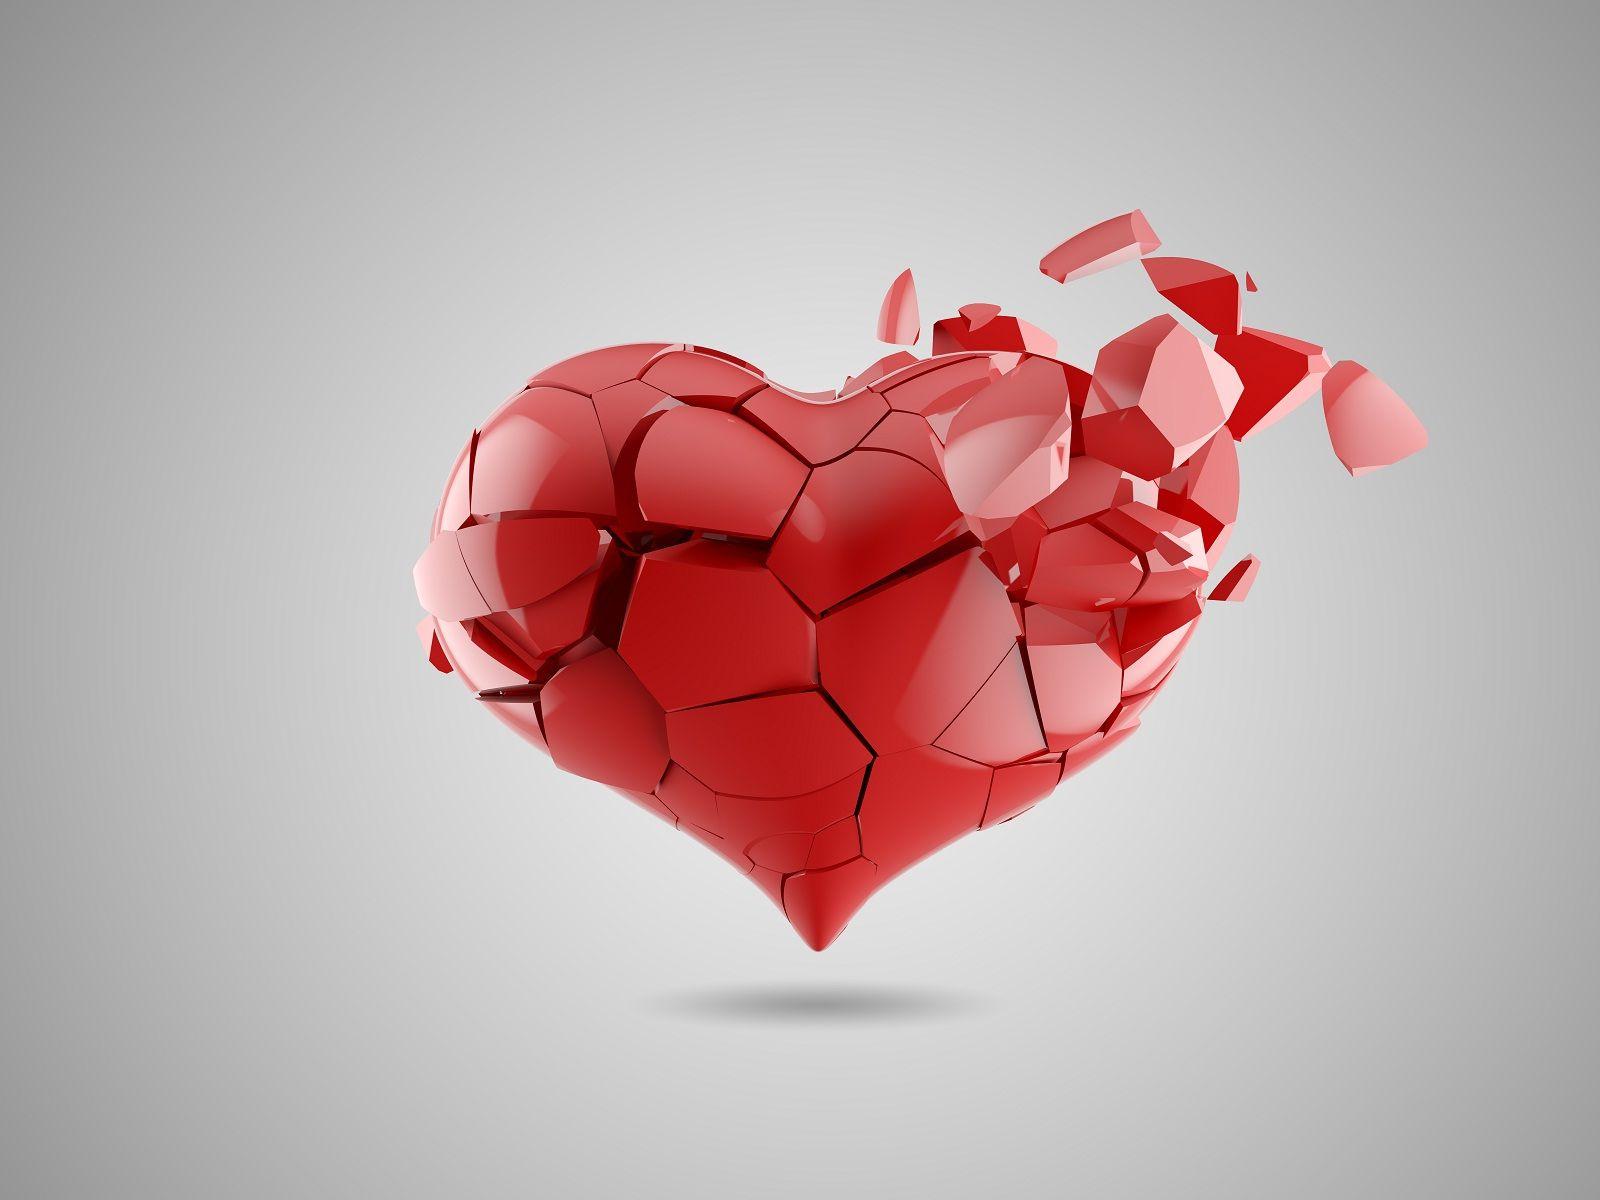 картинки про разбитых сердец кунгаева